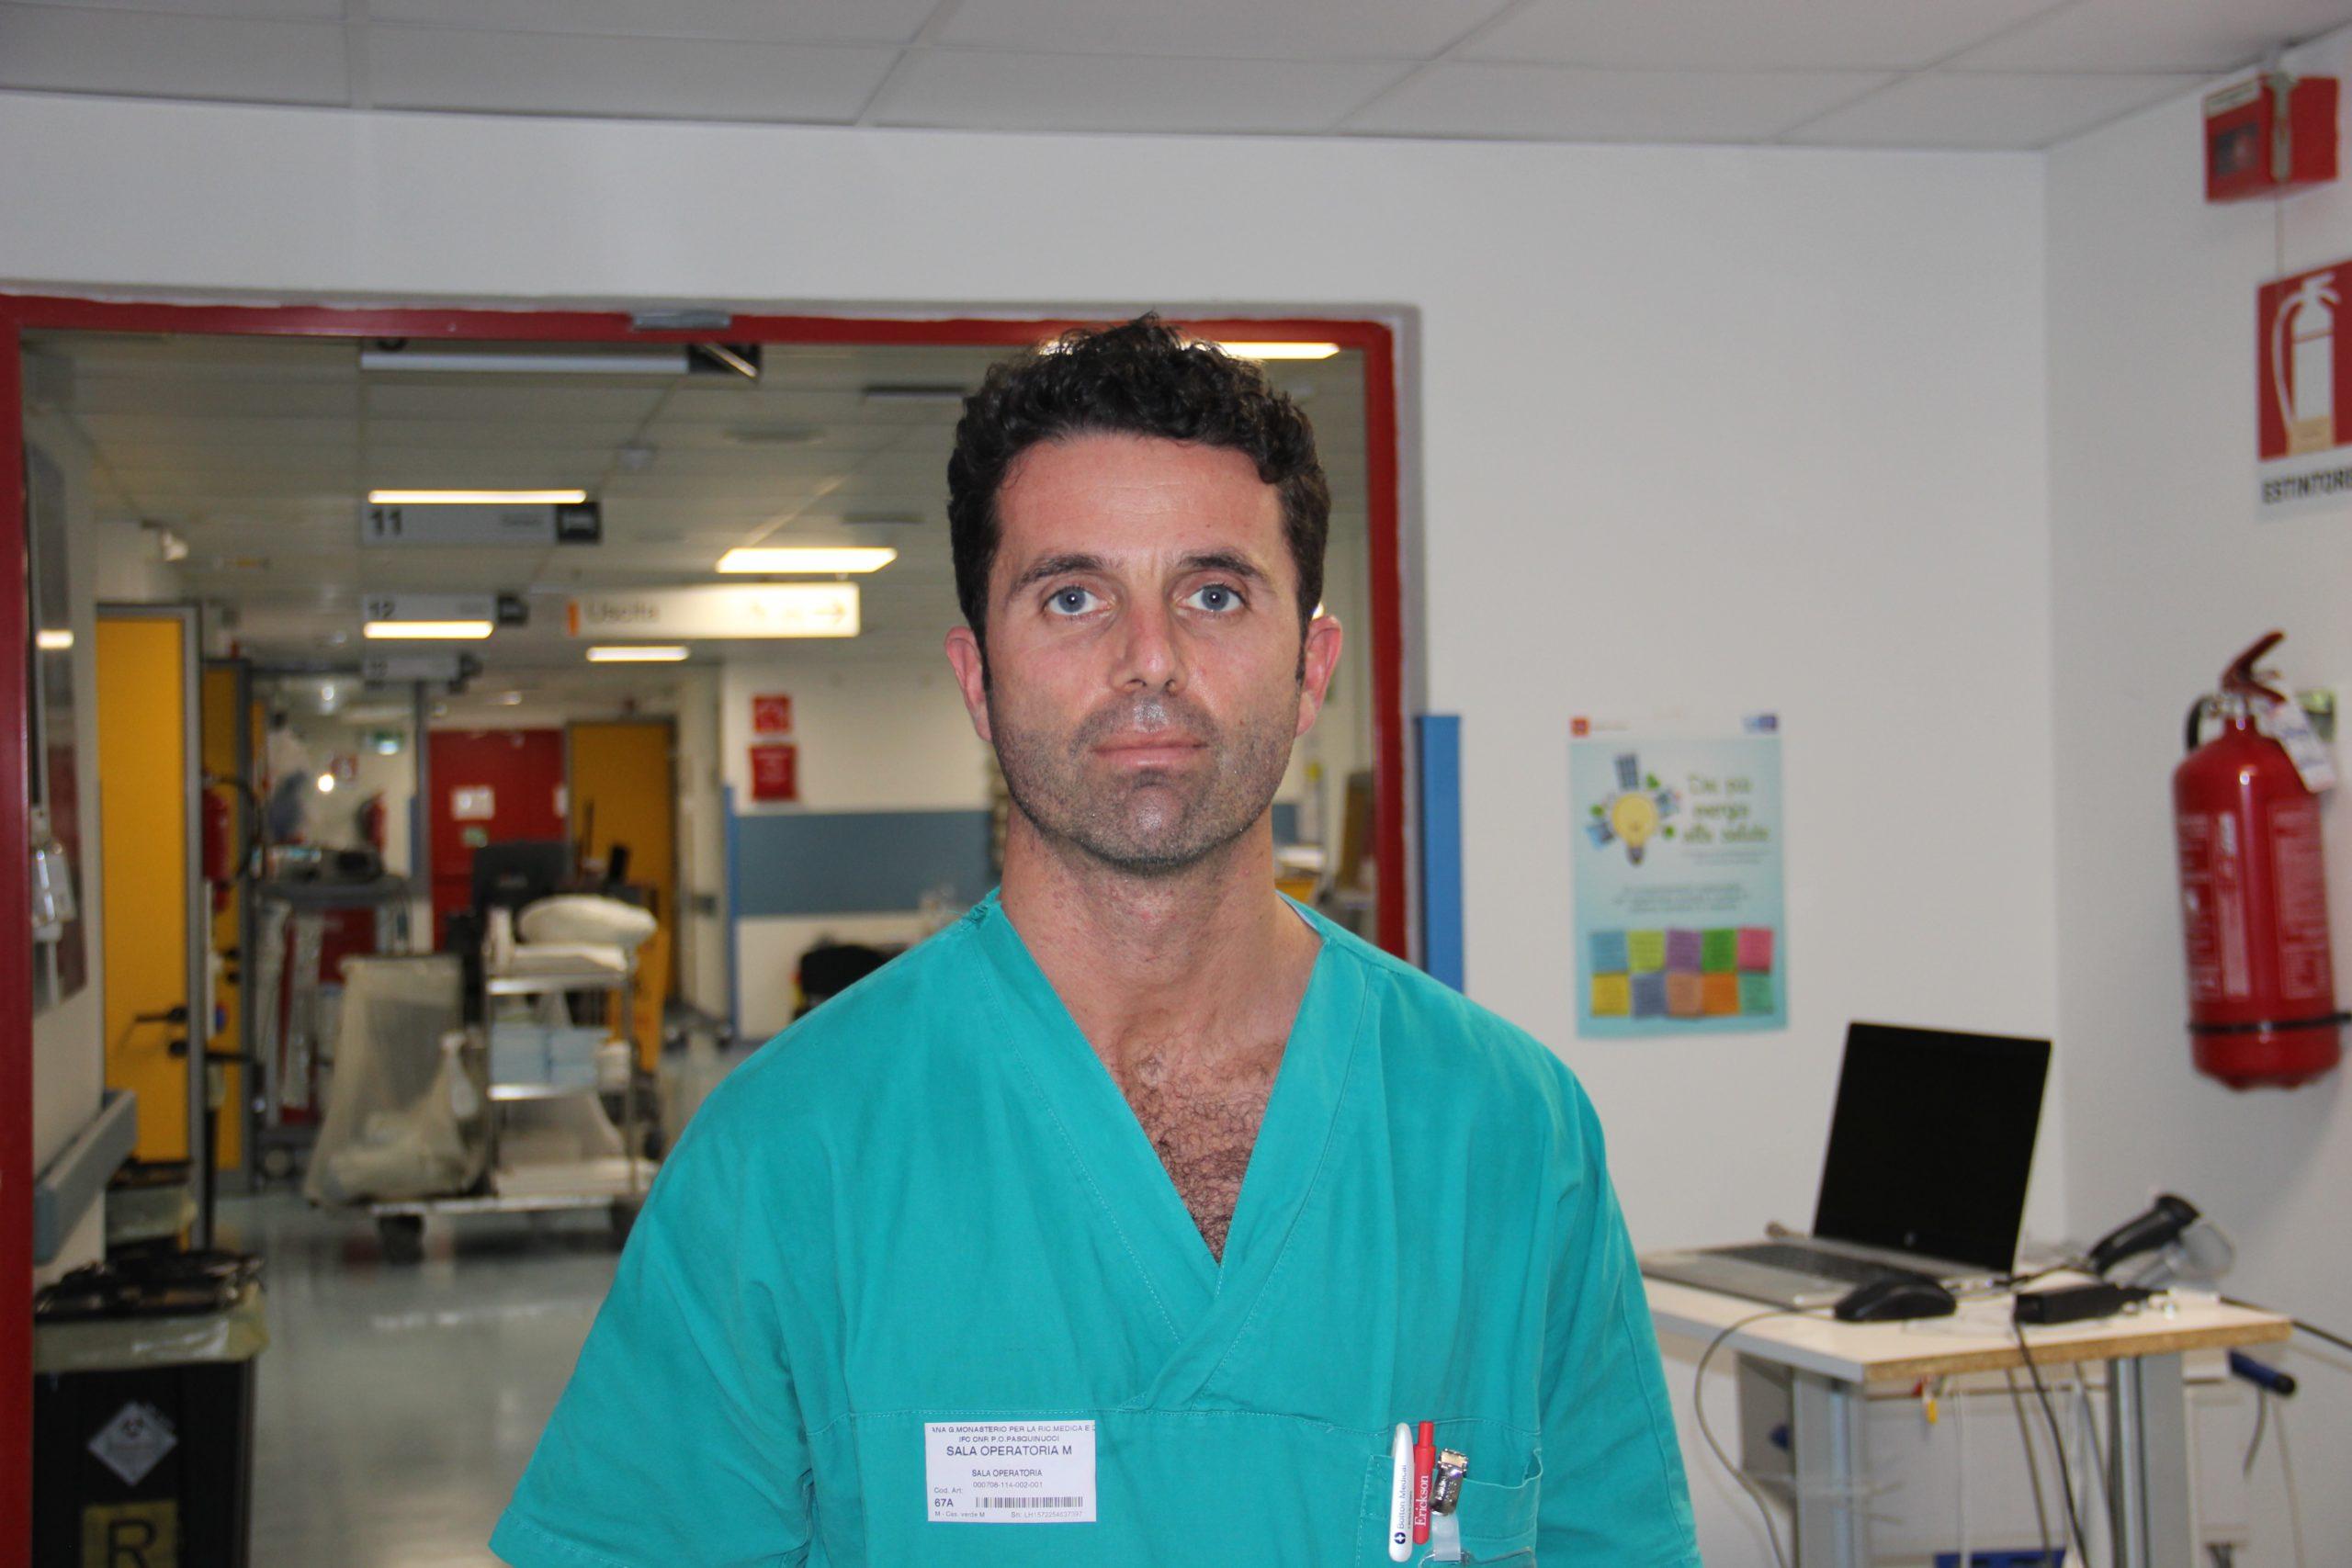 UOC Cardiologia e medicina cardiovascolare - Pisa